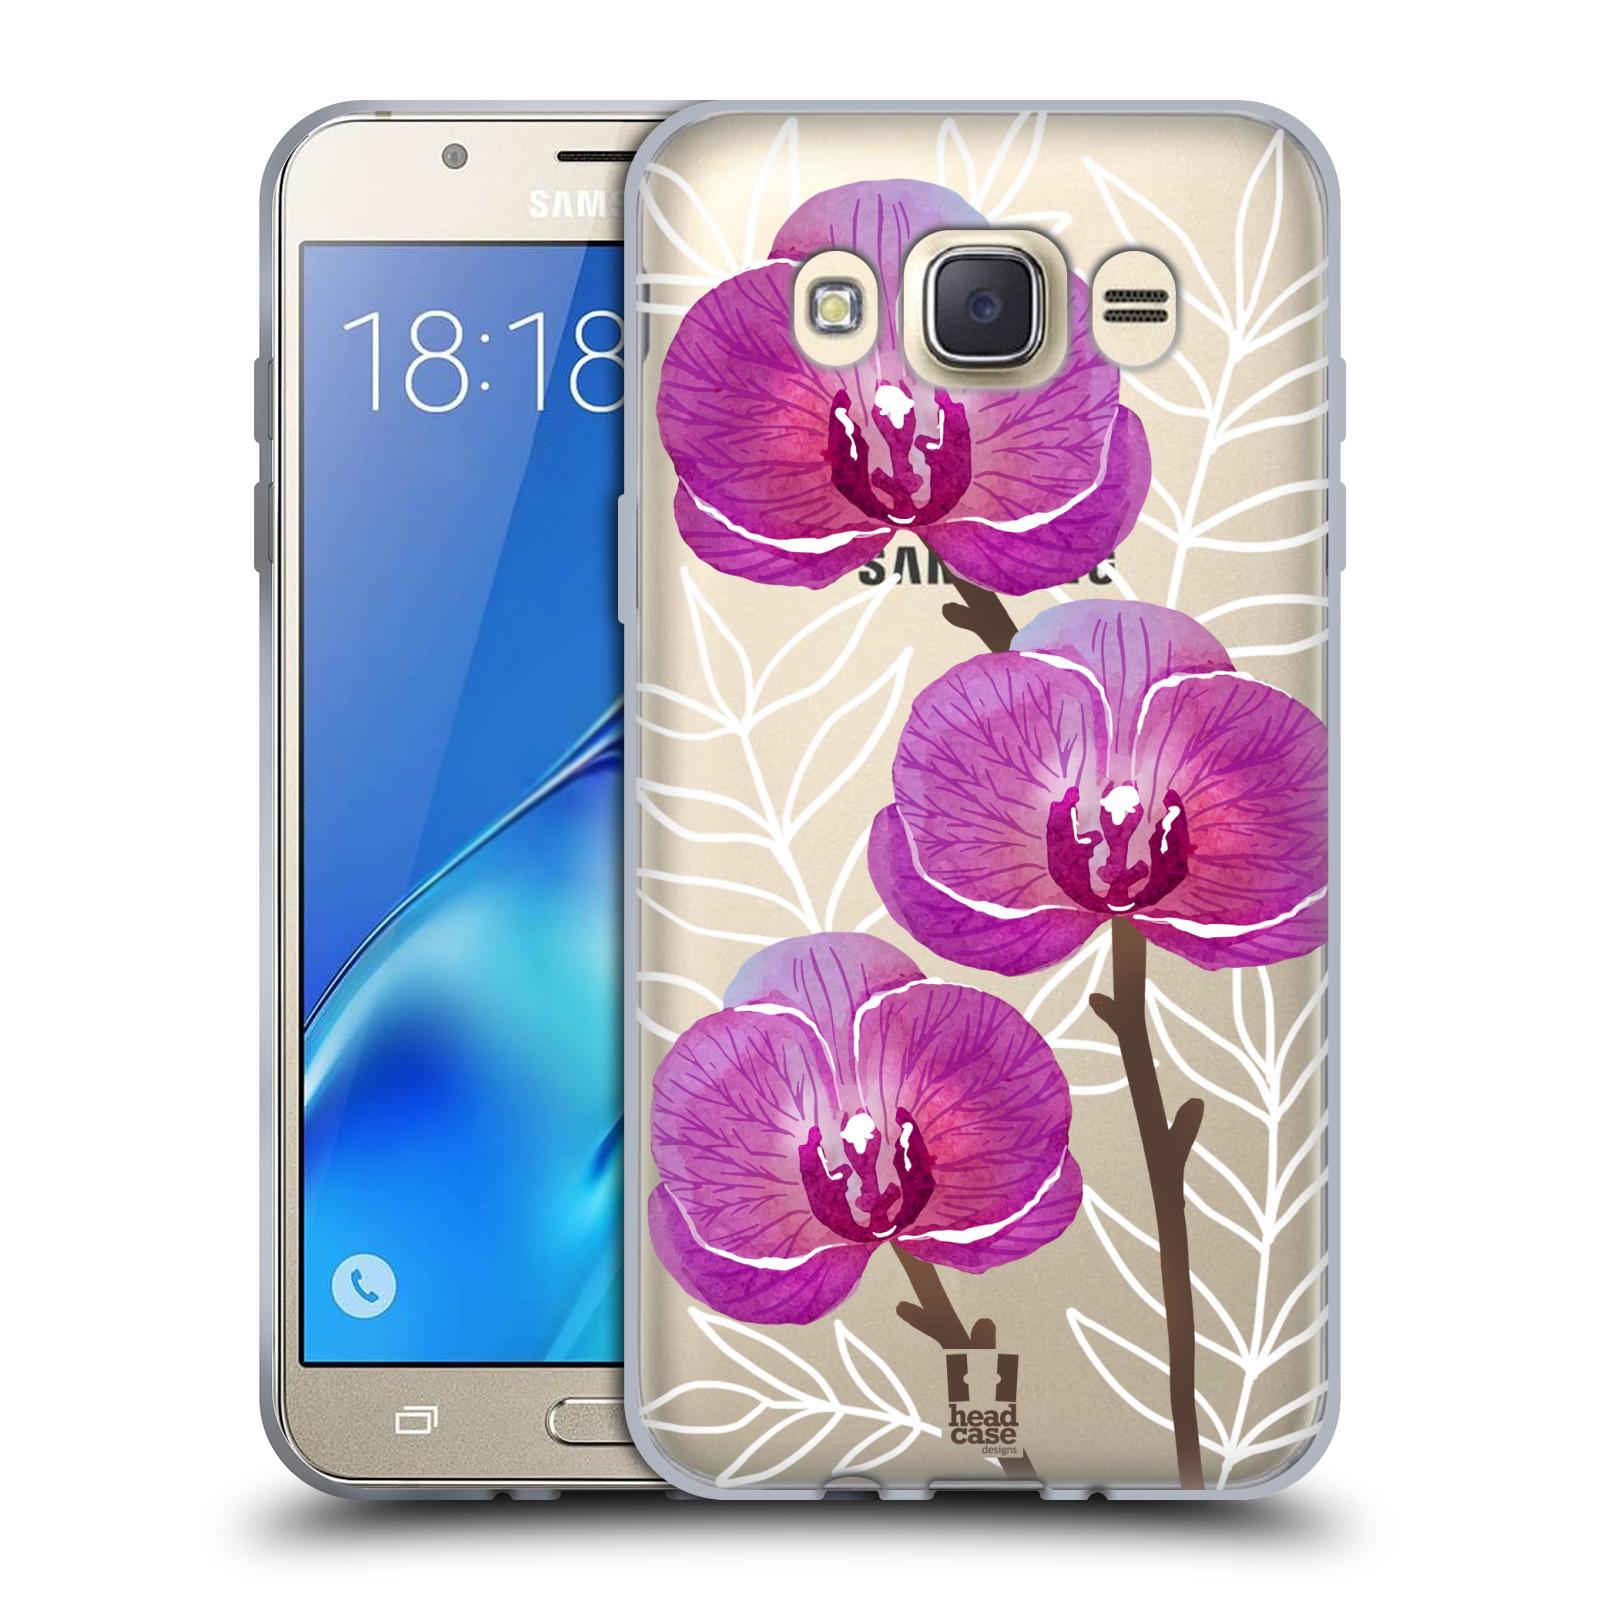 Silikonové pouzdro na mobil Samsung Galaxy J7 (2016) - Head Case - Hezoučké kvítky - průhledné